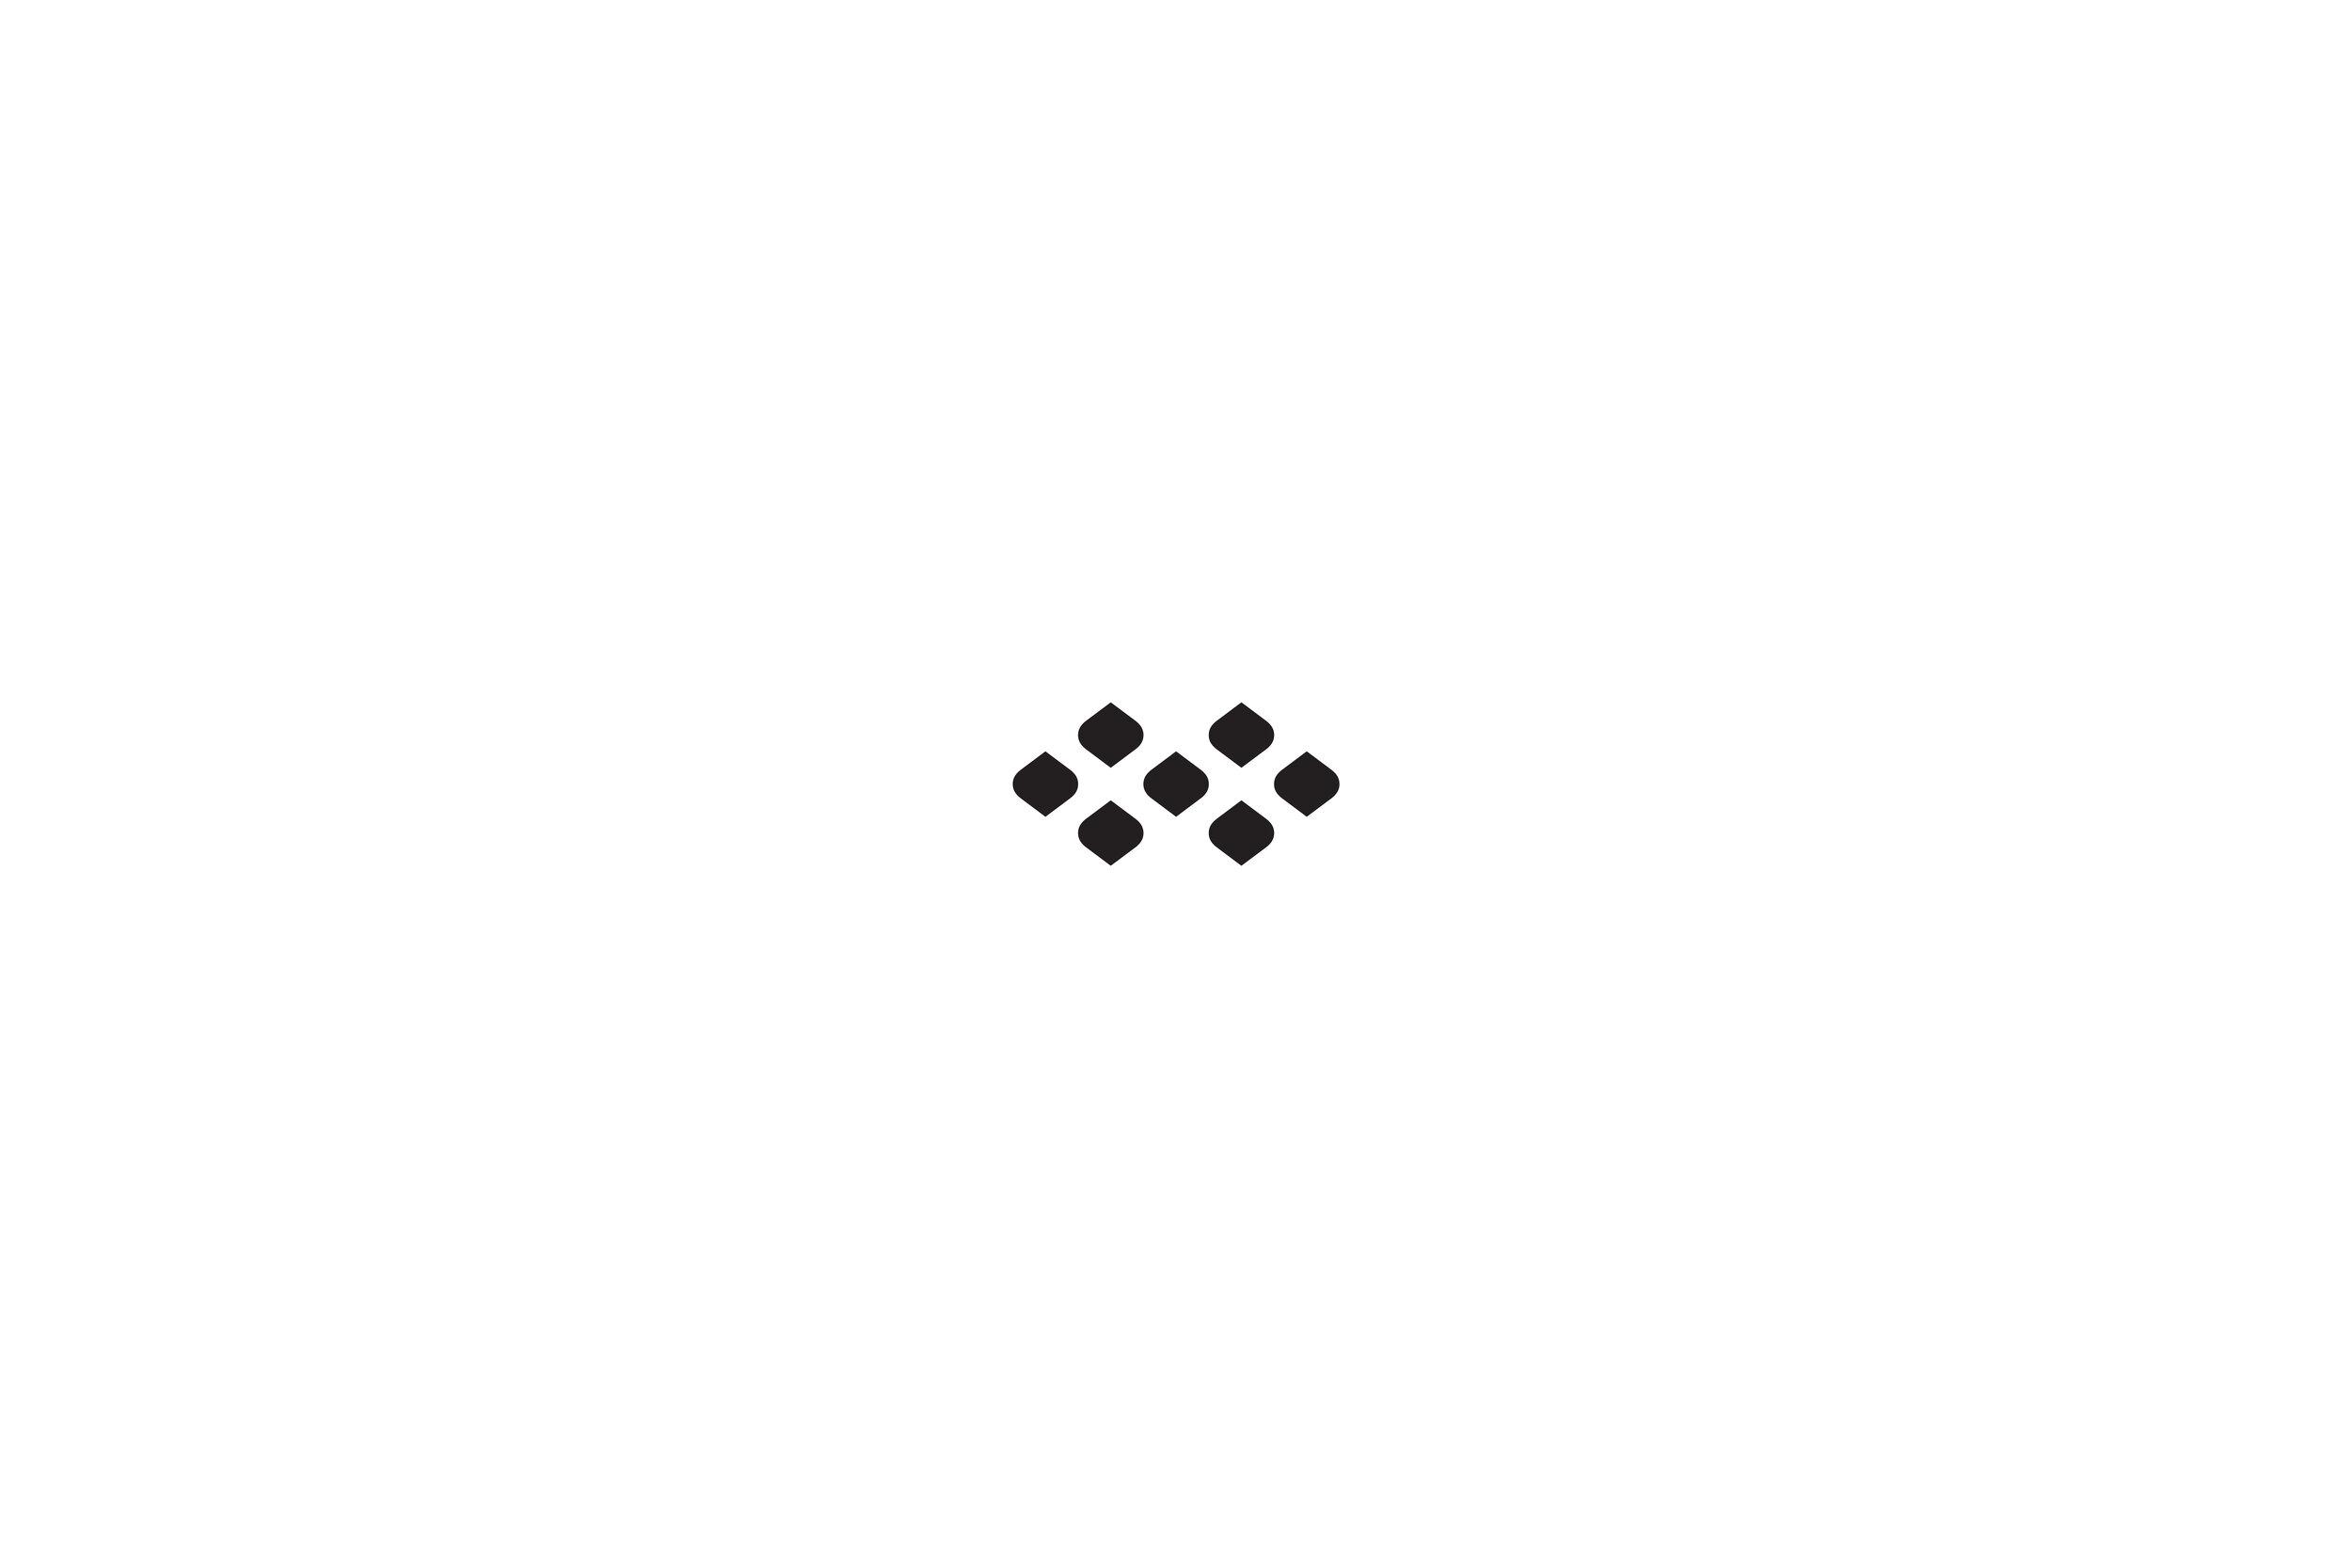 vortic_facebook_logocollection2-11